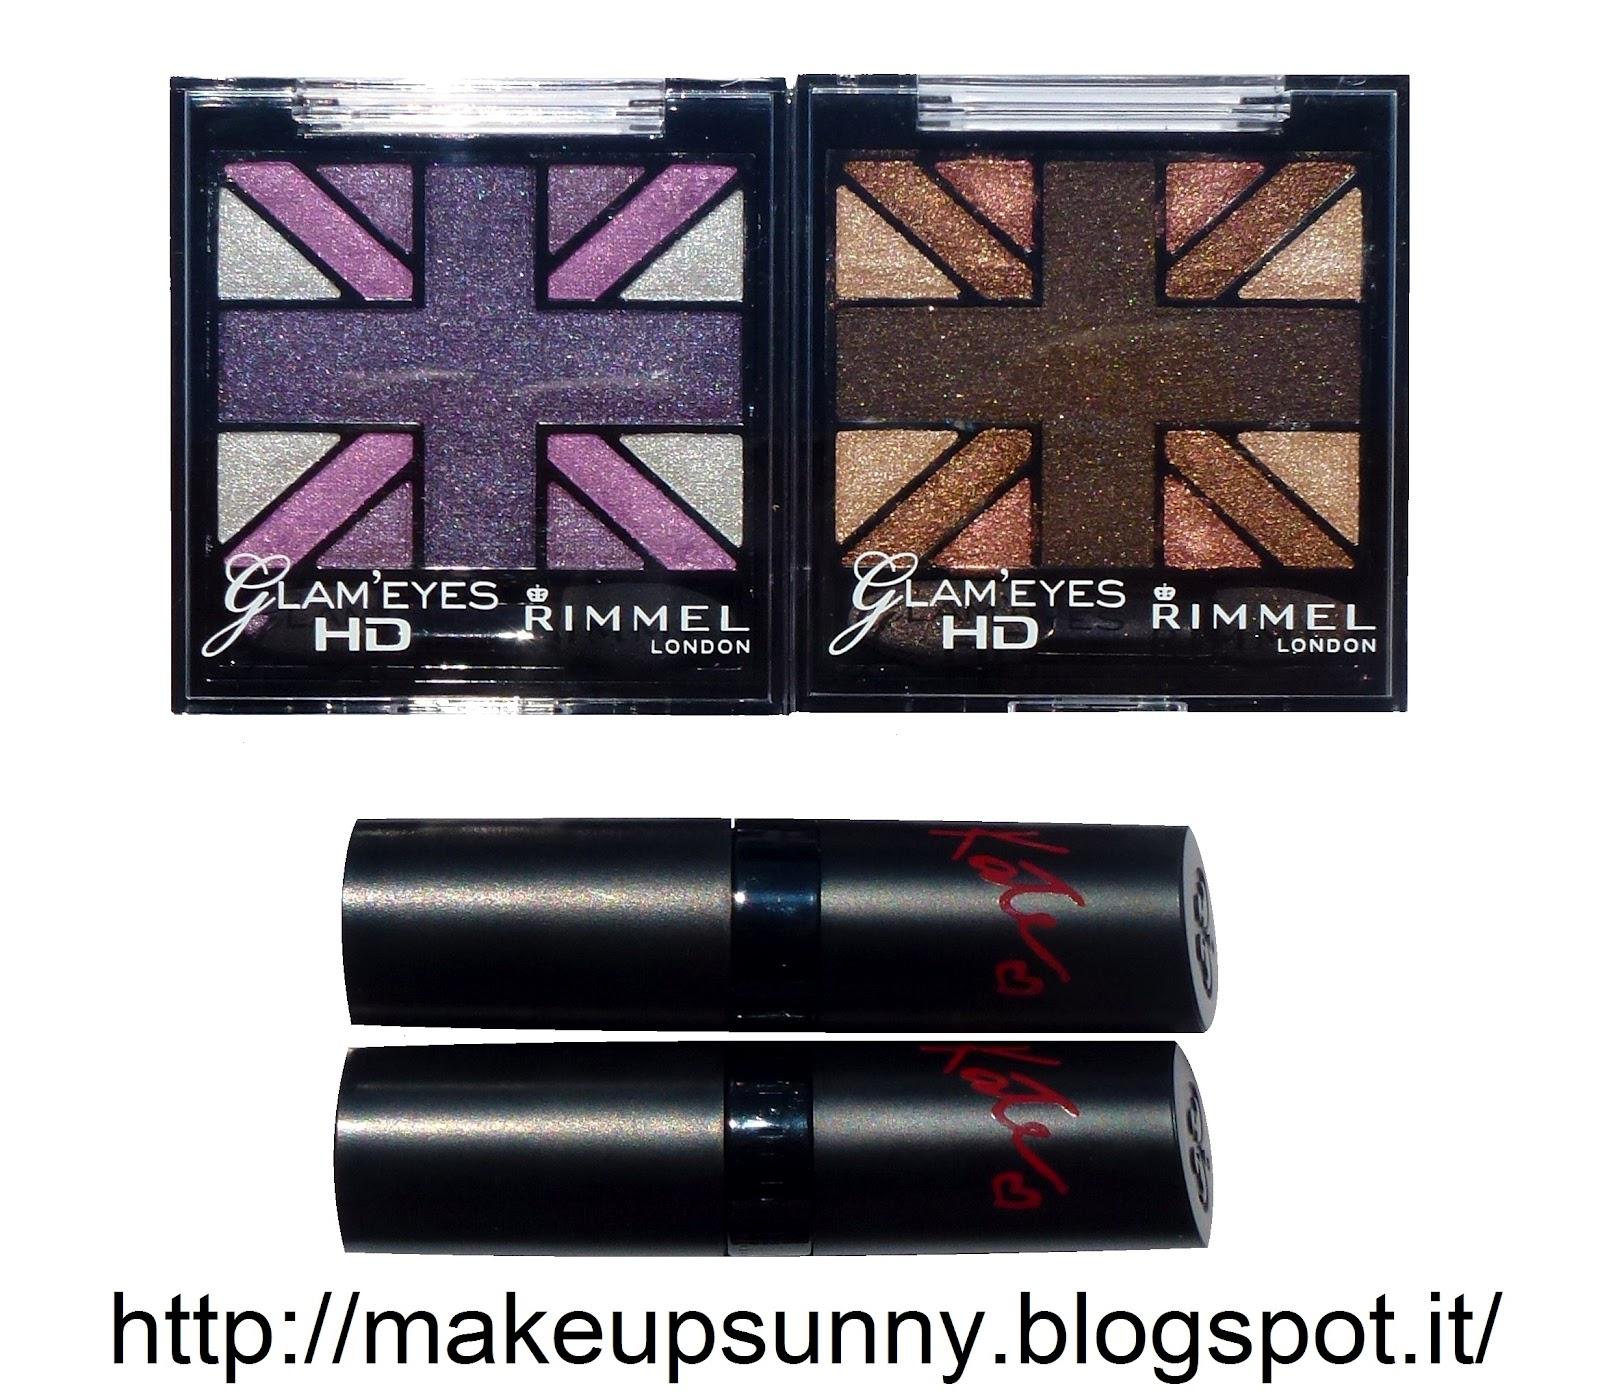 http://1.bp.blogspot.com/-hrg6eW0cpPI/T4QTQJEGZaI/AAAAAAAADDw/SDZqA_KncJo/s1600/rimmel+london+kate+moss+collection+rossetti+lipstick+03+08+glam+eyes+hd+union+jack+palette+ombretti+eyeshadow+02+english+oak+06+purple+reign.jpg